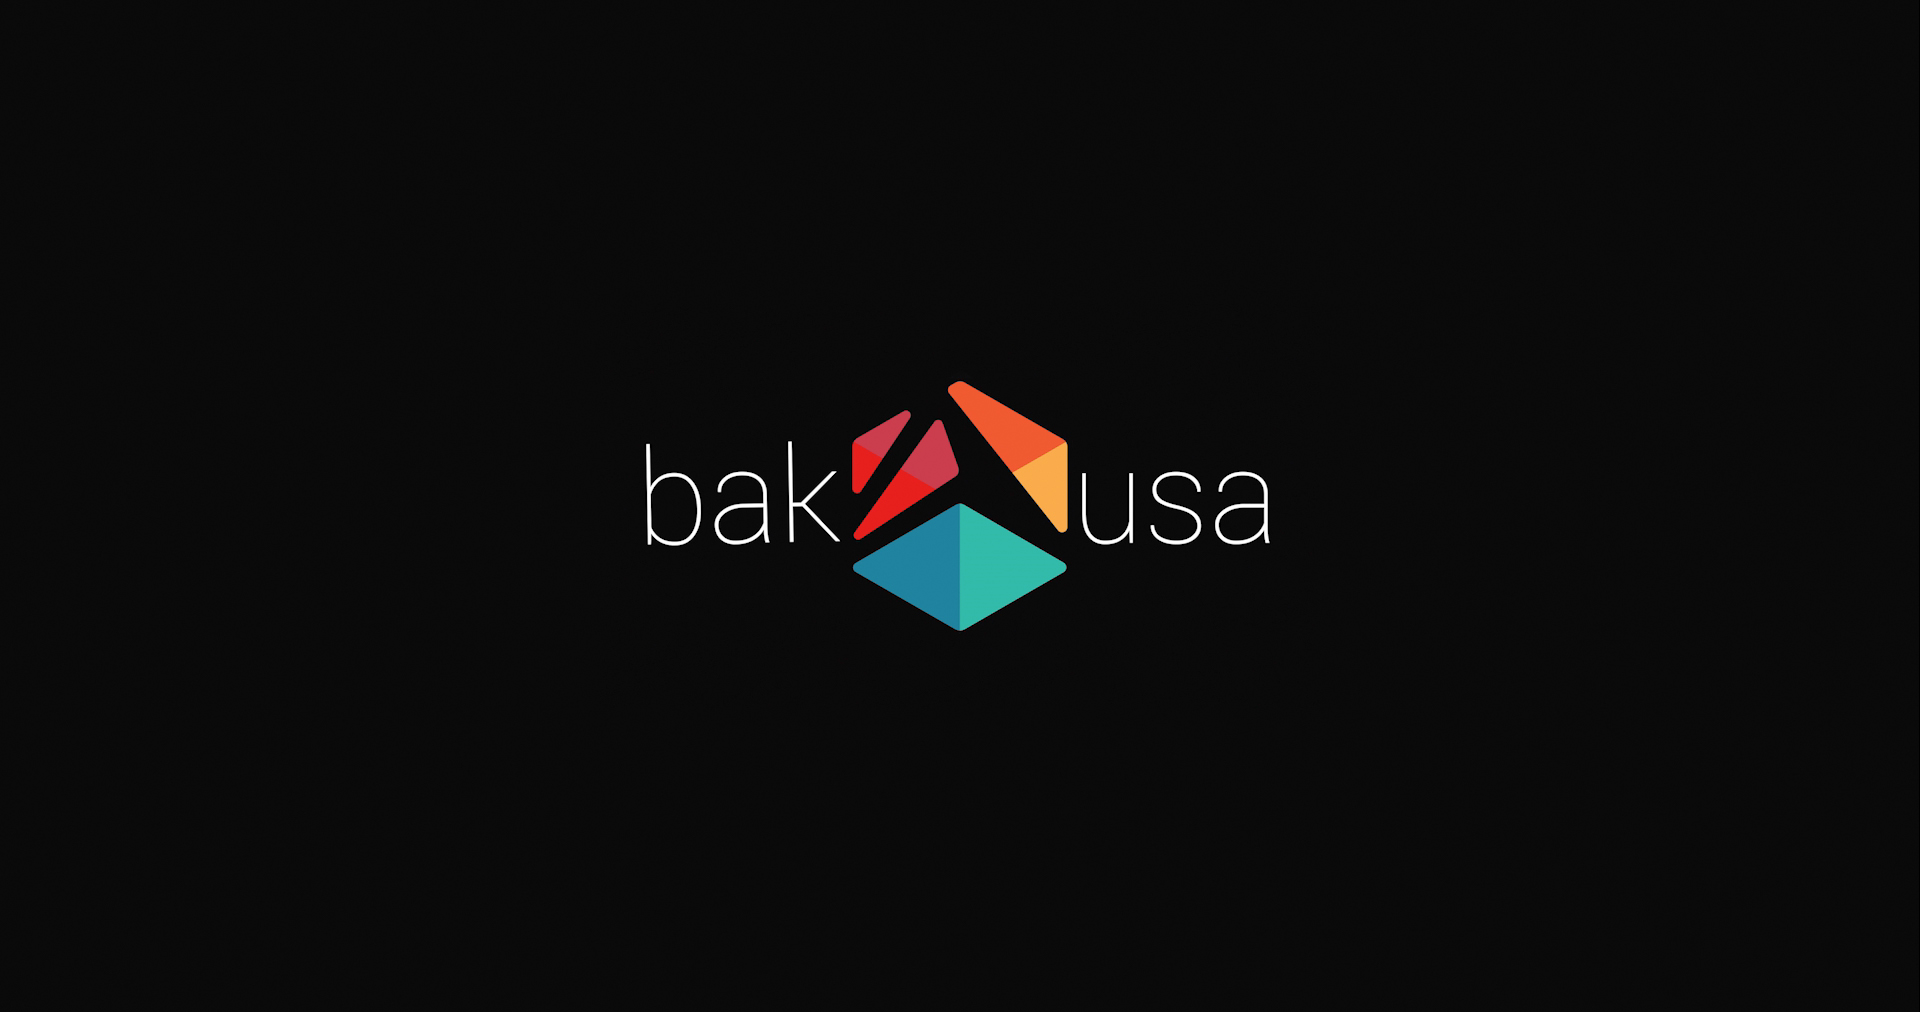 Bak_USA_Atlas12__0000_Layer 12.jpg